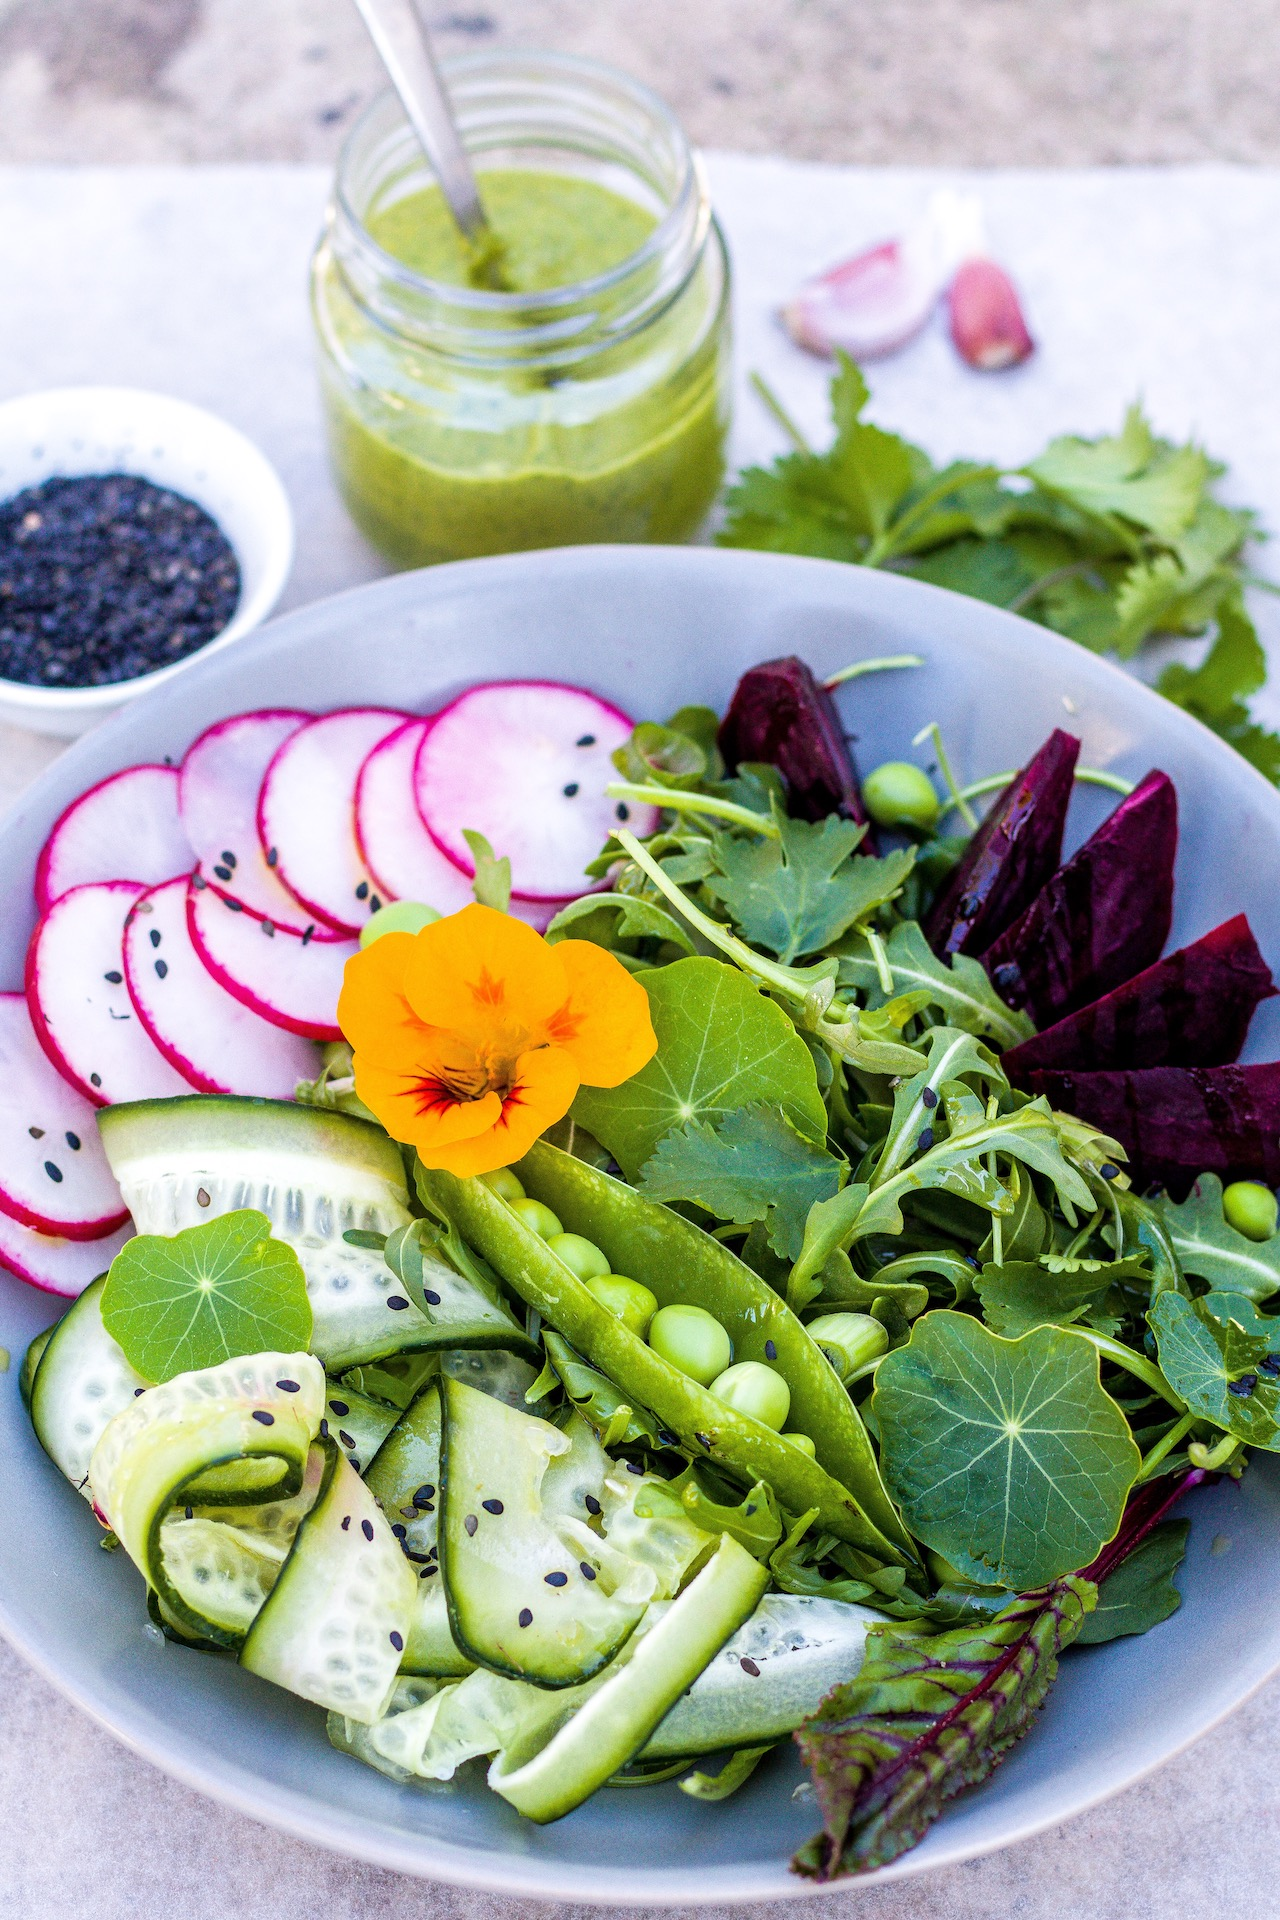 Frühlingshafter Superfoot-Salat mit Avocado-Koriander-Dressing. GF & Vegan.  #detox #superfood #rotebeete #erbsen #salat #avocado